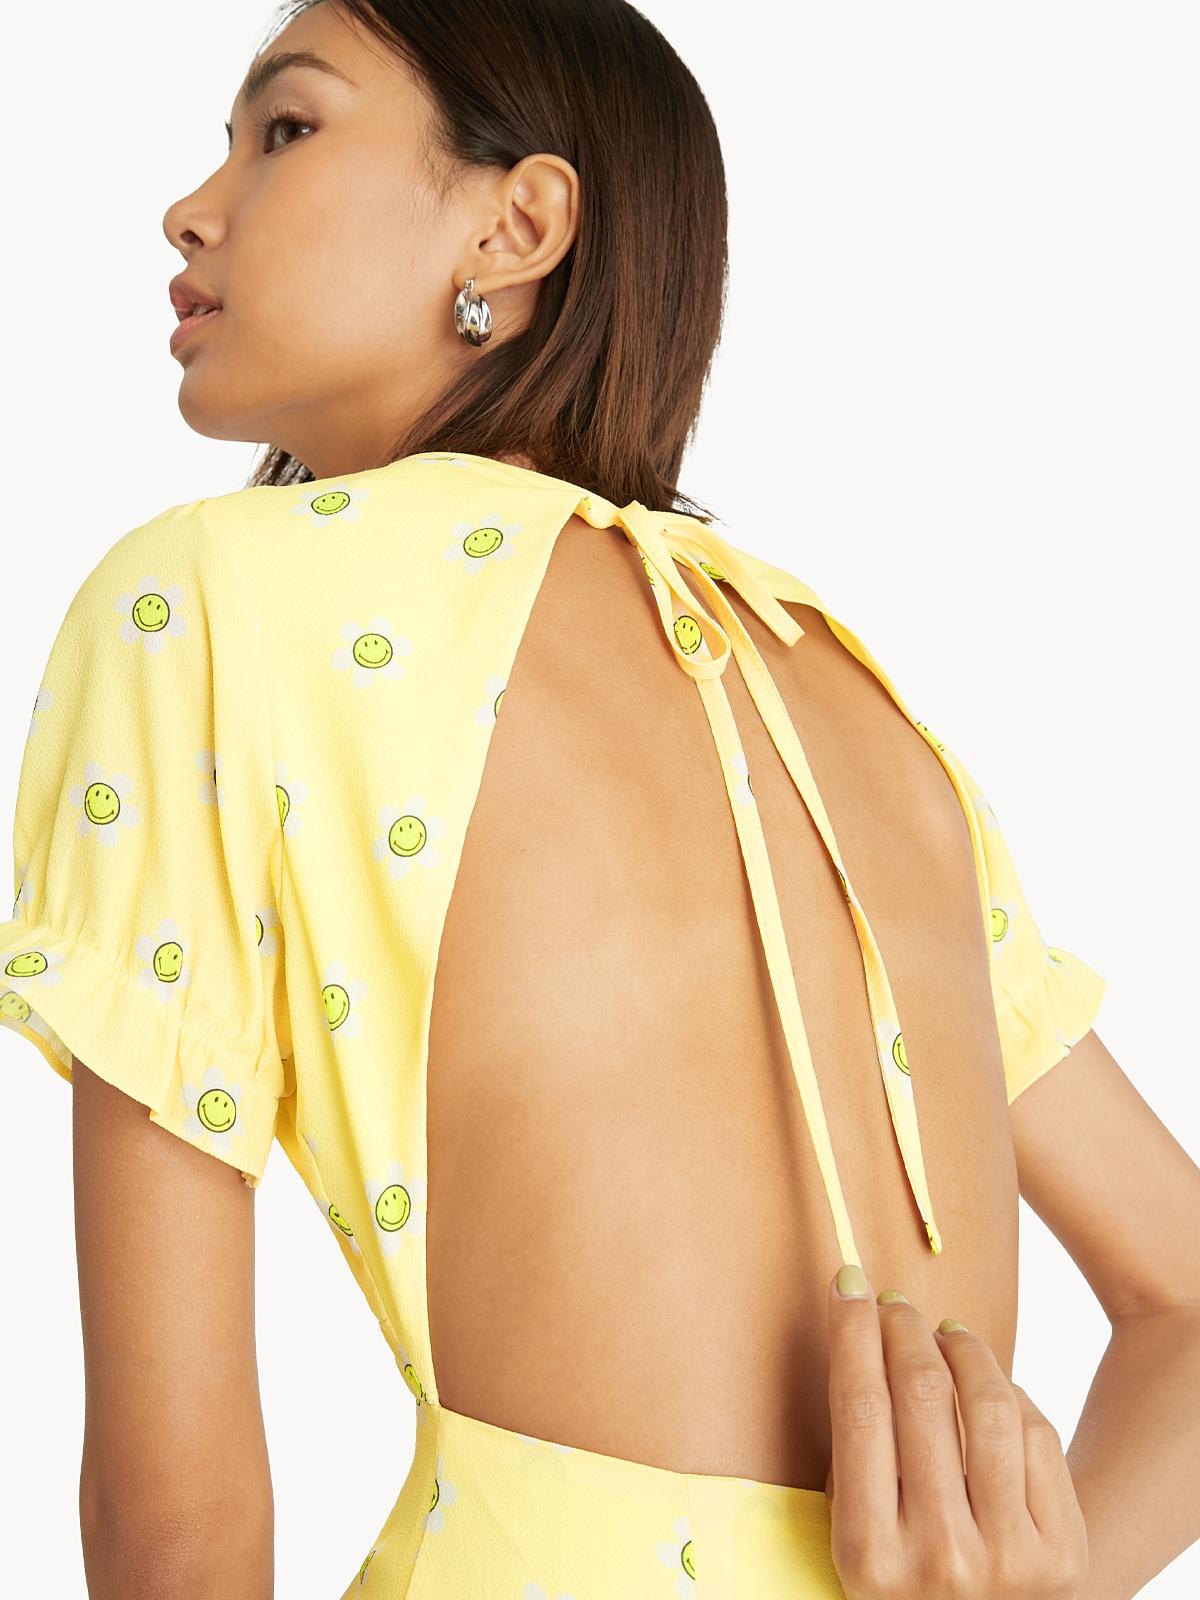 Pomelo x Smiley Open Back Dress Yellow